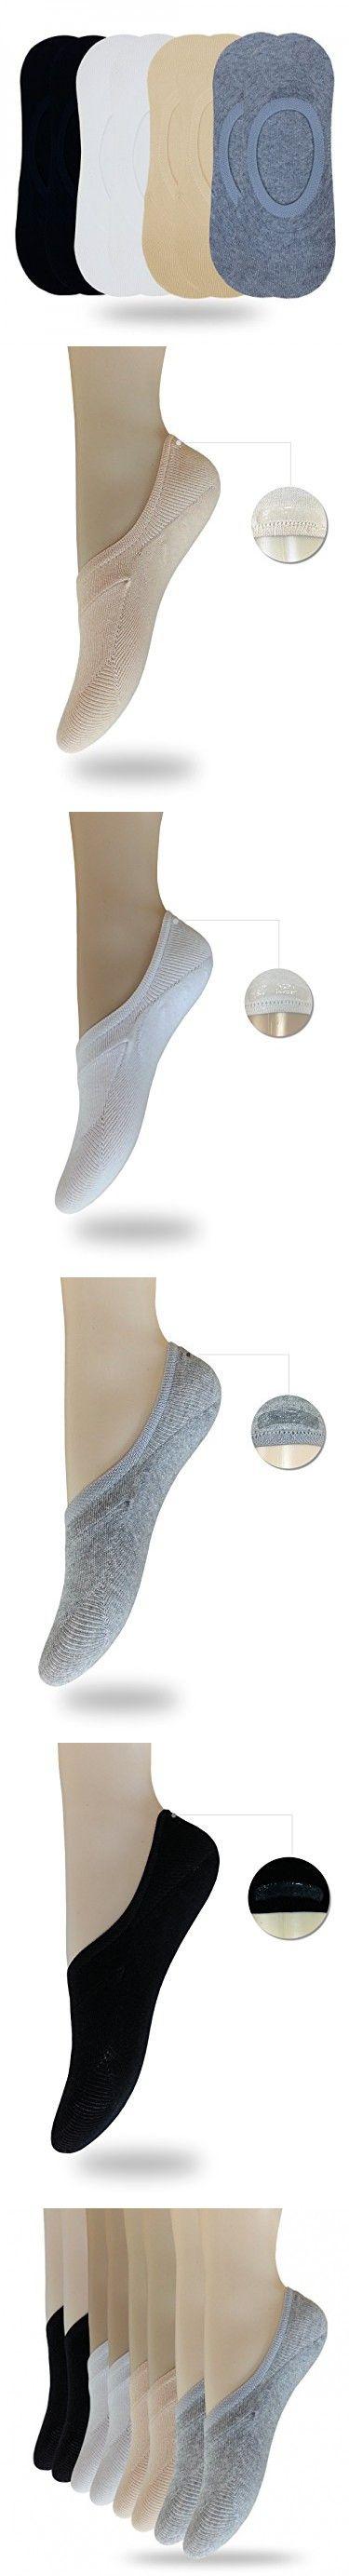 Eedor Women's 8 Pack Thin Casual No Show Socks Non Slip Flat Boat Line